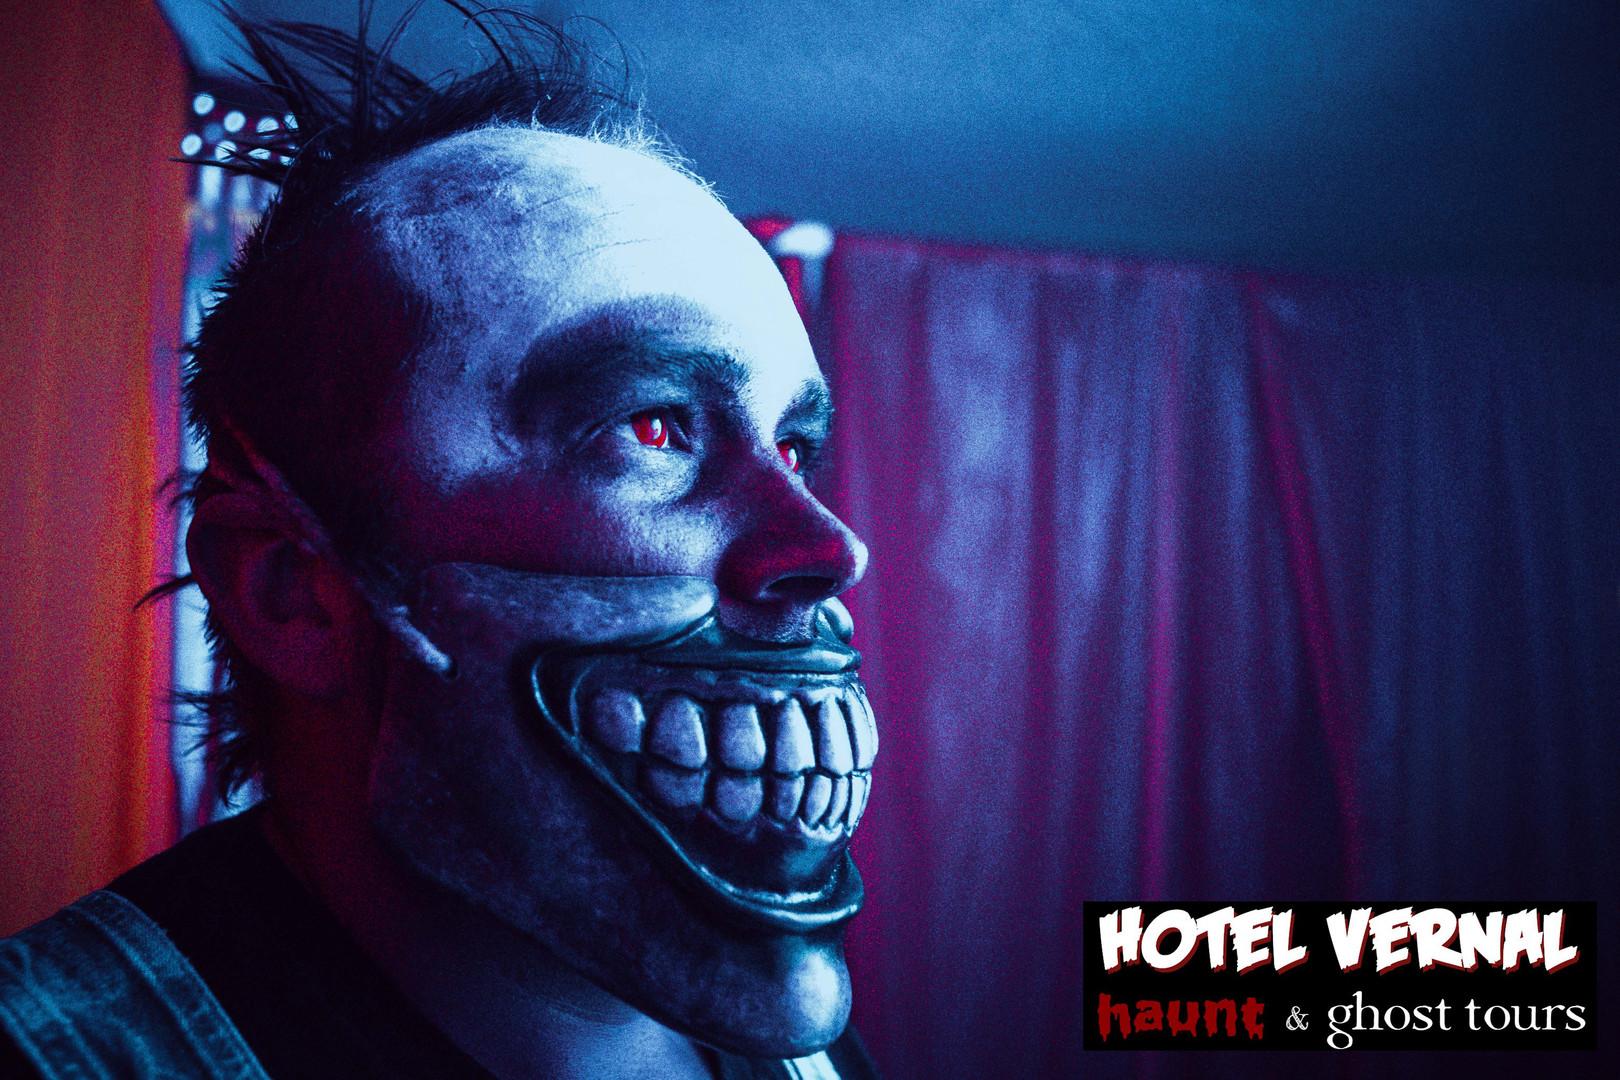 keith-clown.jpg